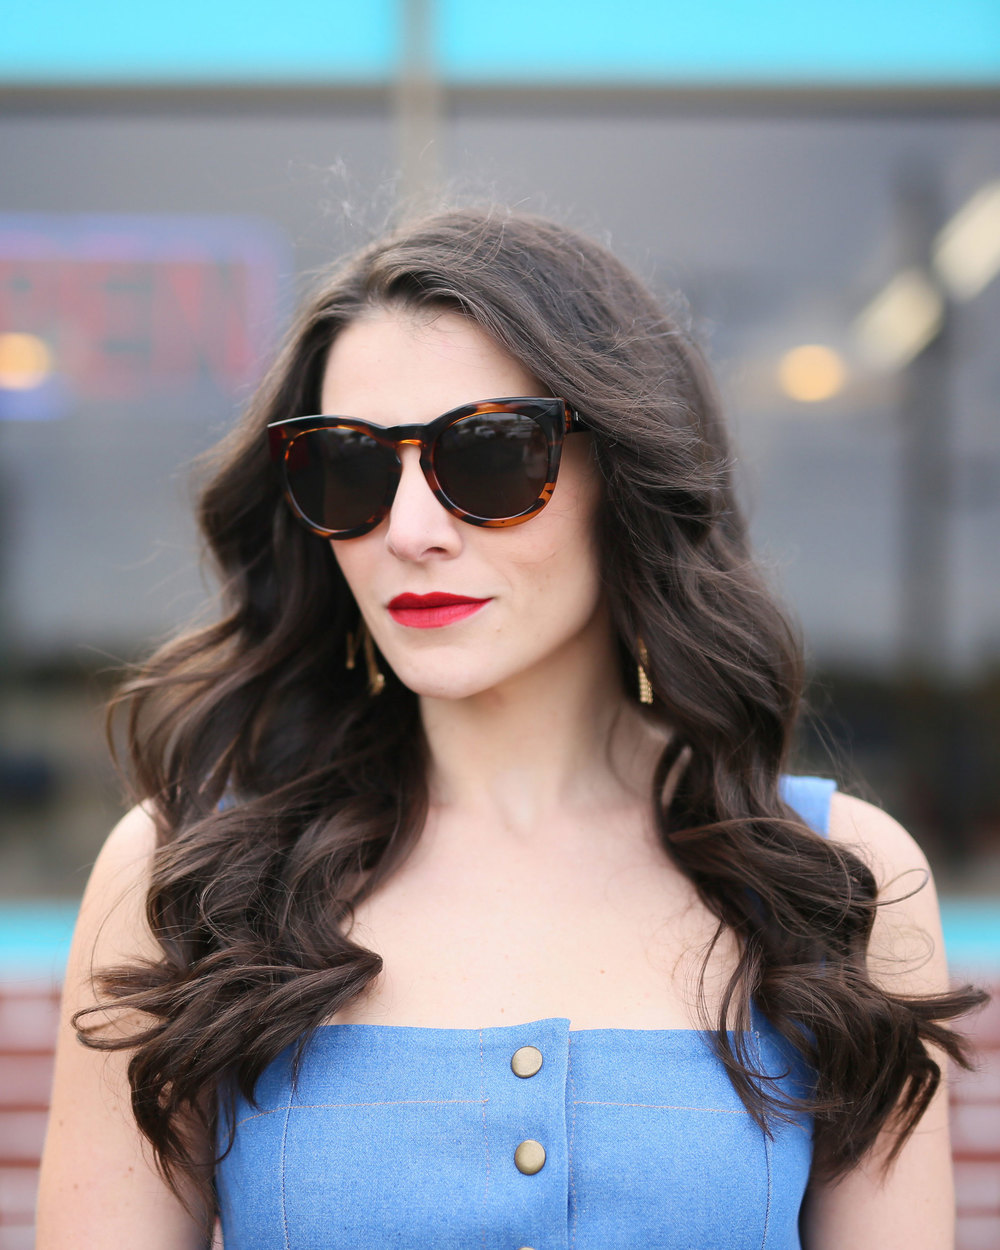 Clayton Candace Dress, Denim Midi Dress, Button-Front Dress, Karen Walker look-alike sunglasses, Le Specs Jealous Games Sunglasses